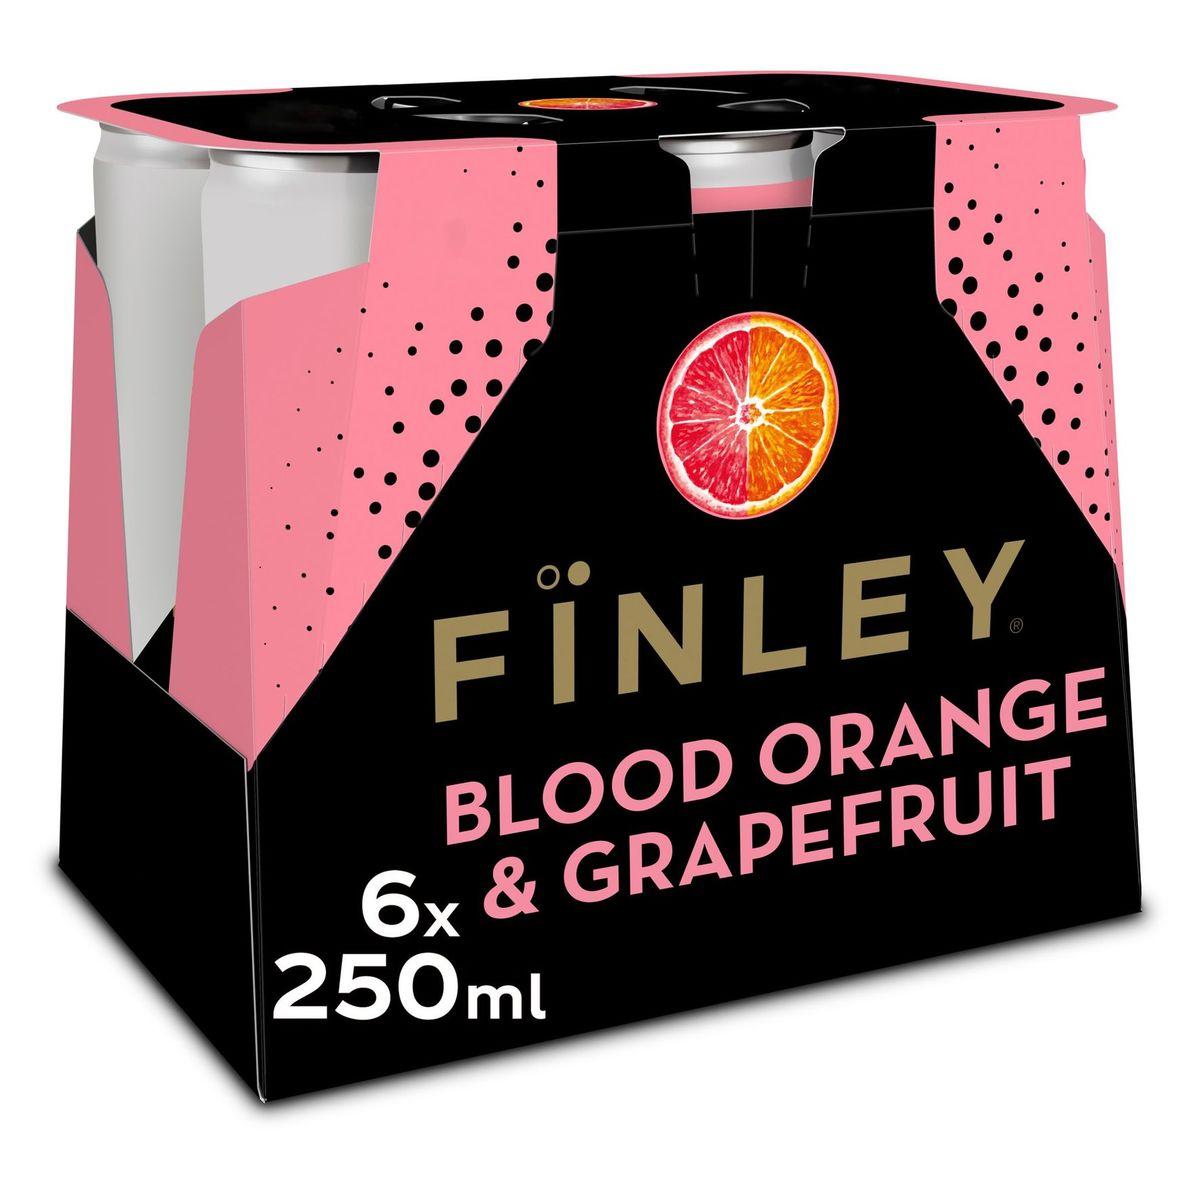 Finley Blood Orange Grapefruit Canette 6 x 250 ml